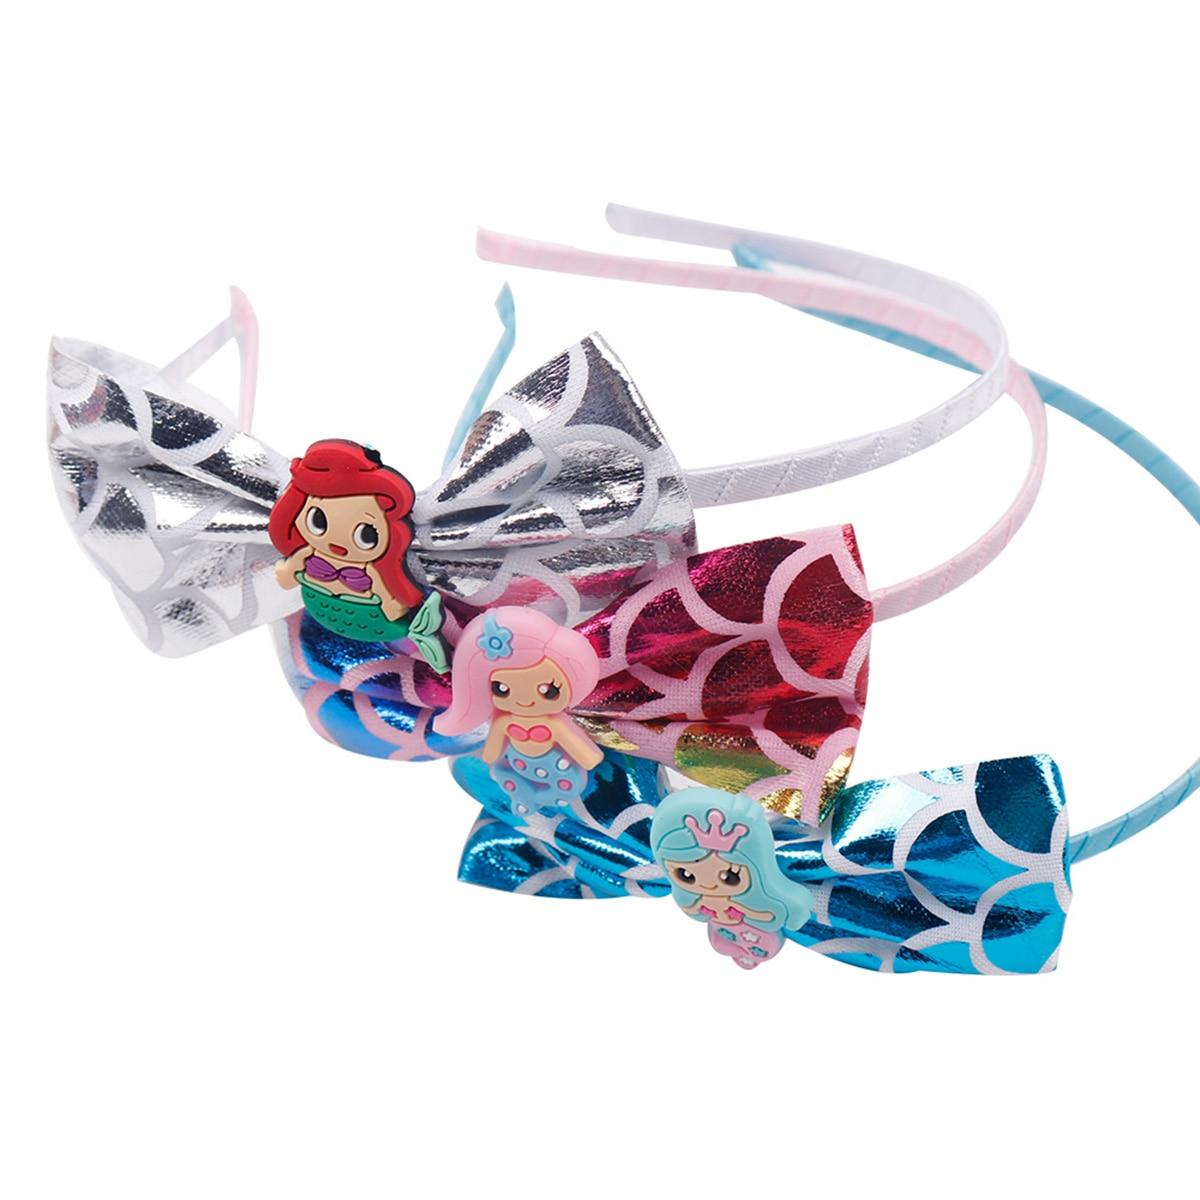 Cartoon Mermaid Baby Headbands For Girls  Handmade Princess Fish Scales Bow Baby Hairband Headband Newborn Hair Accessories New